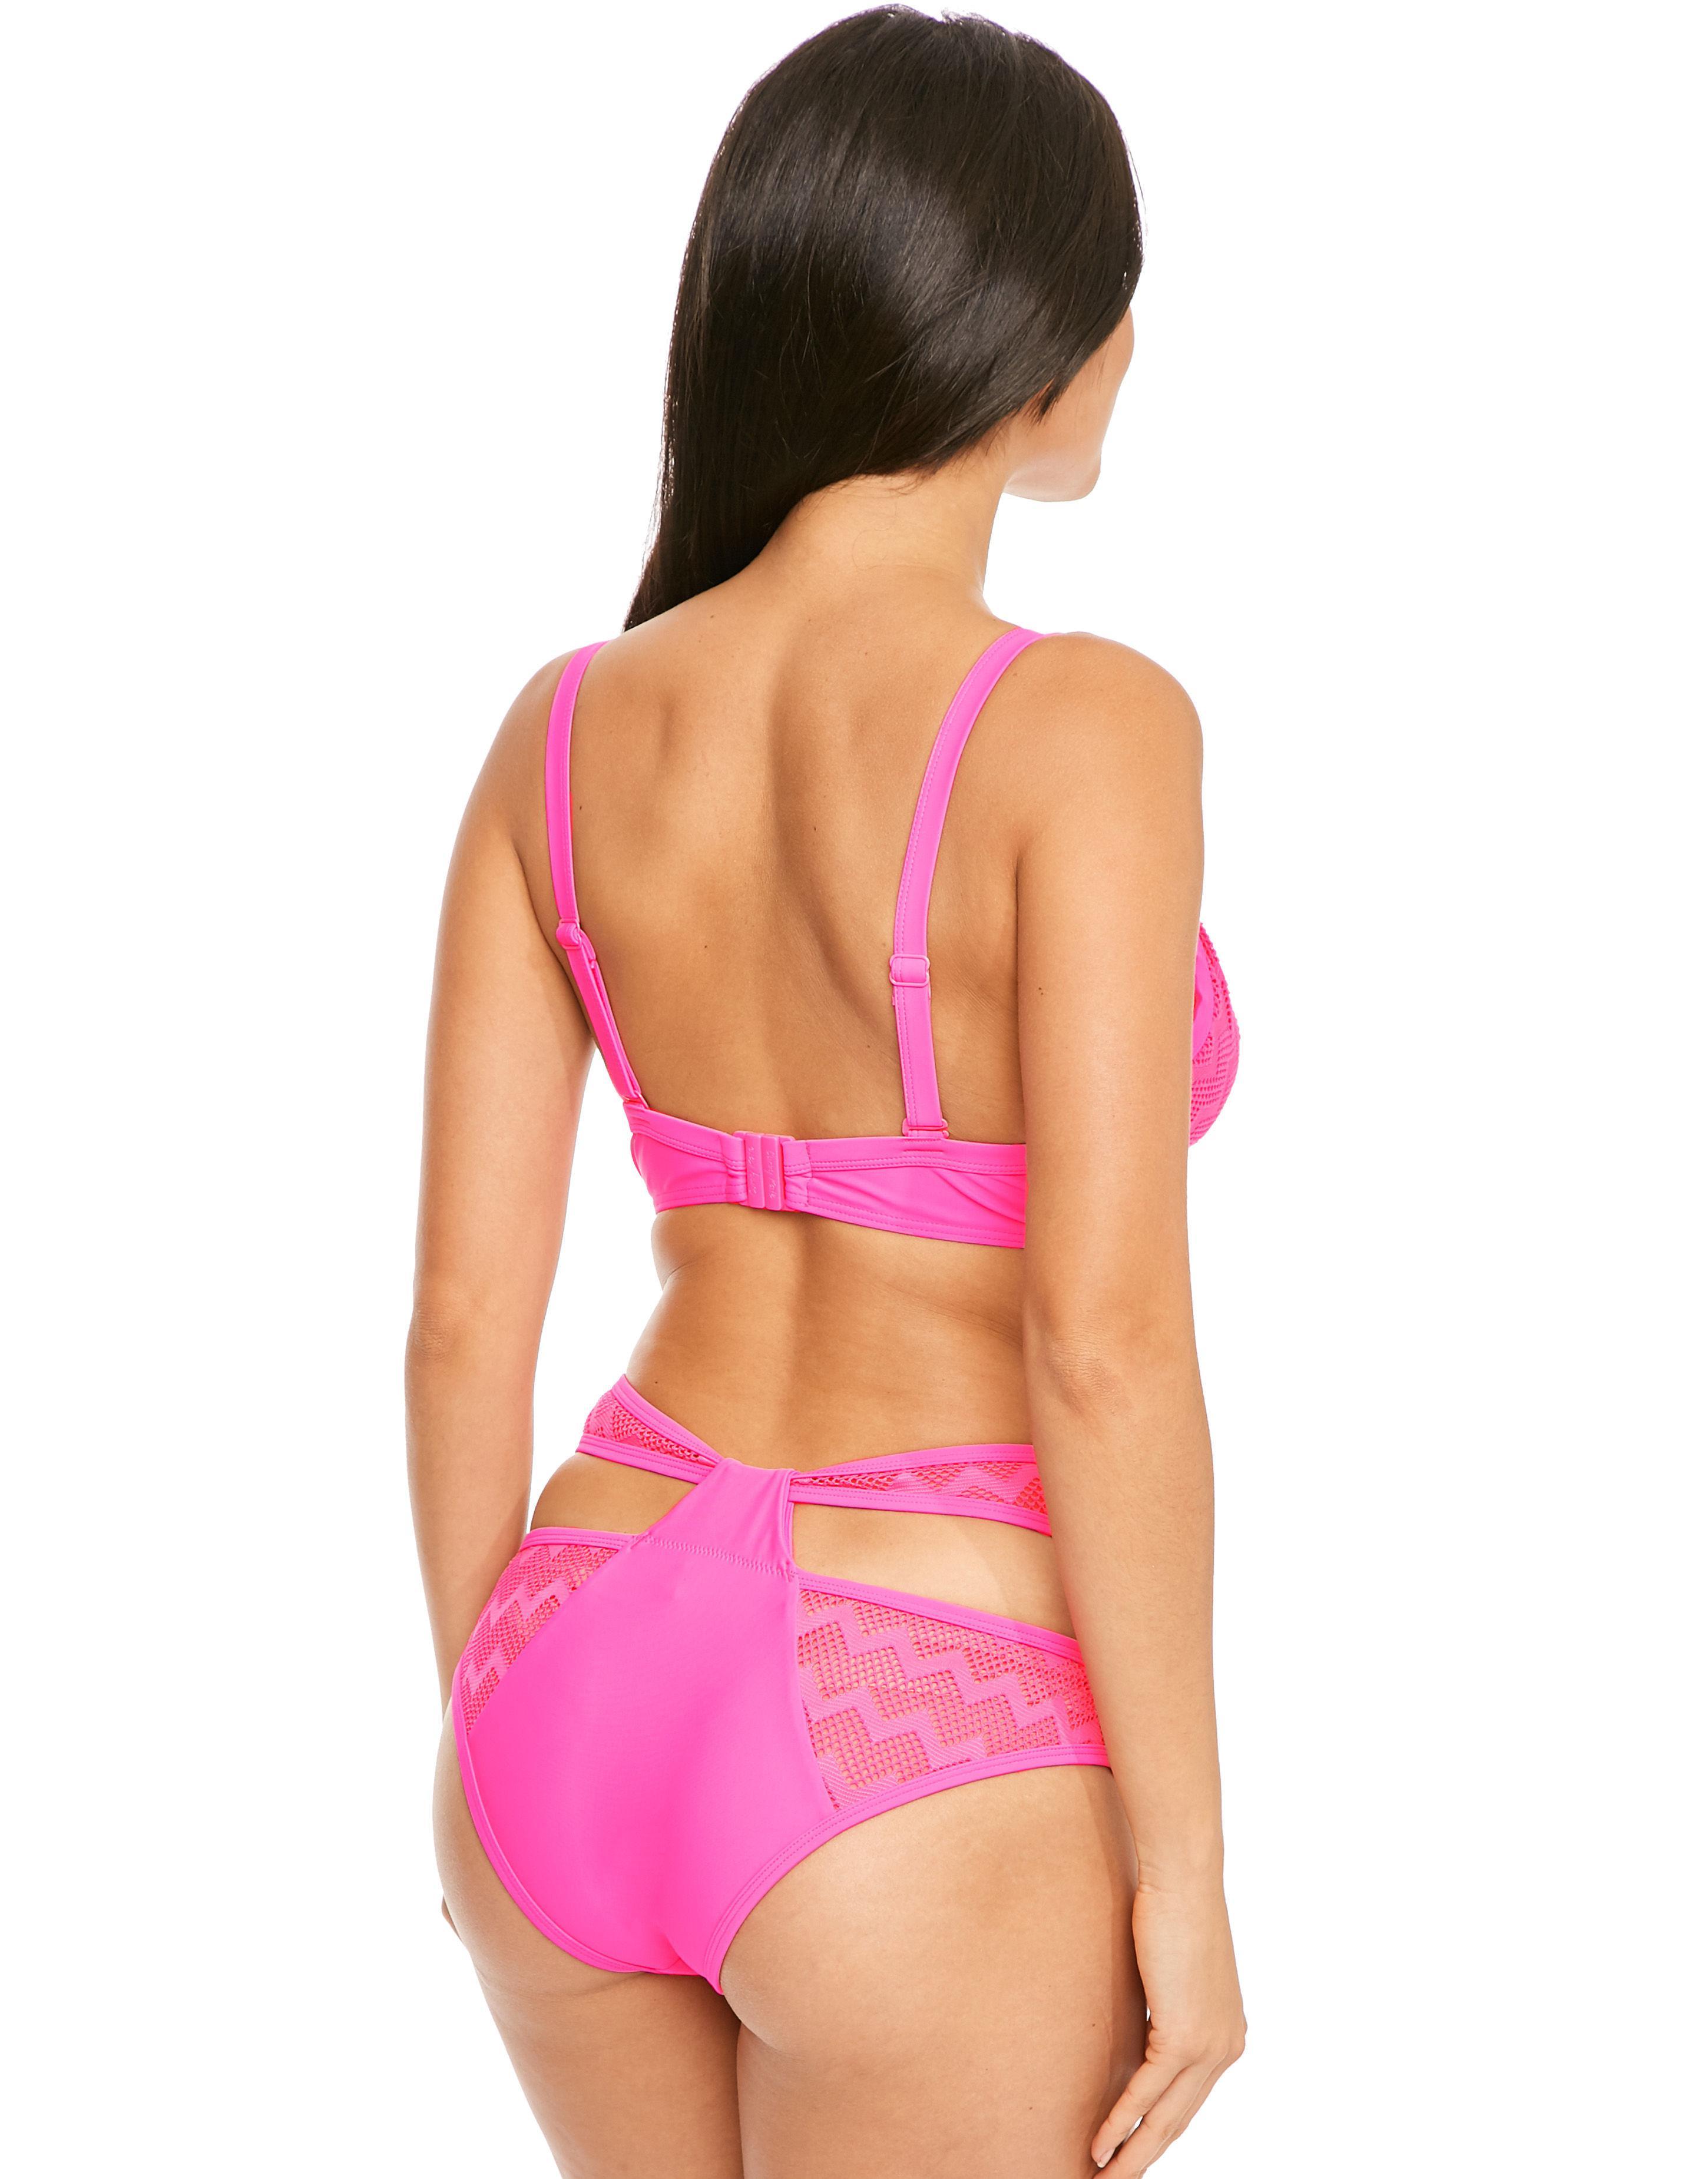 5570ad841c Curvy Kate Hi Voltage Plunge Bikini Top in Pink - Lyst